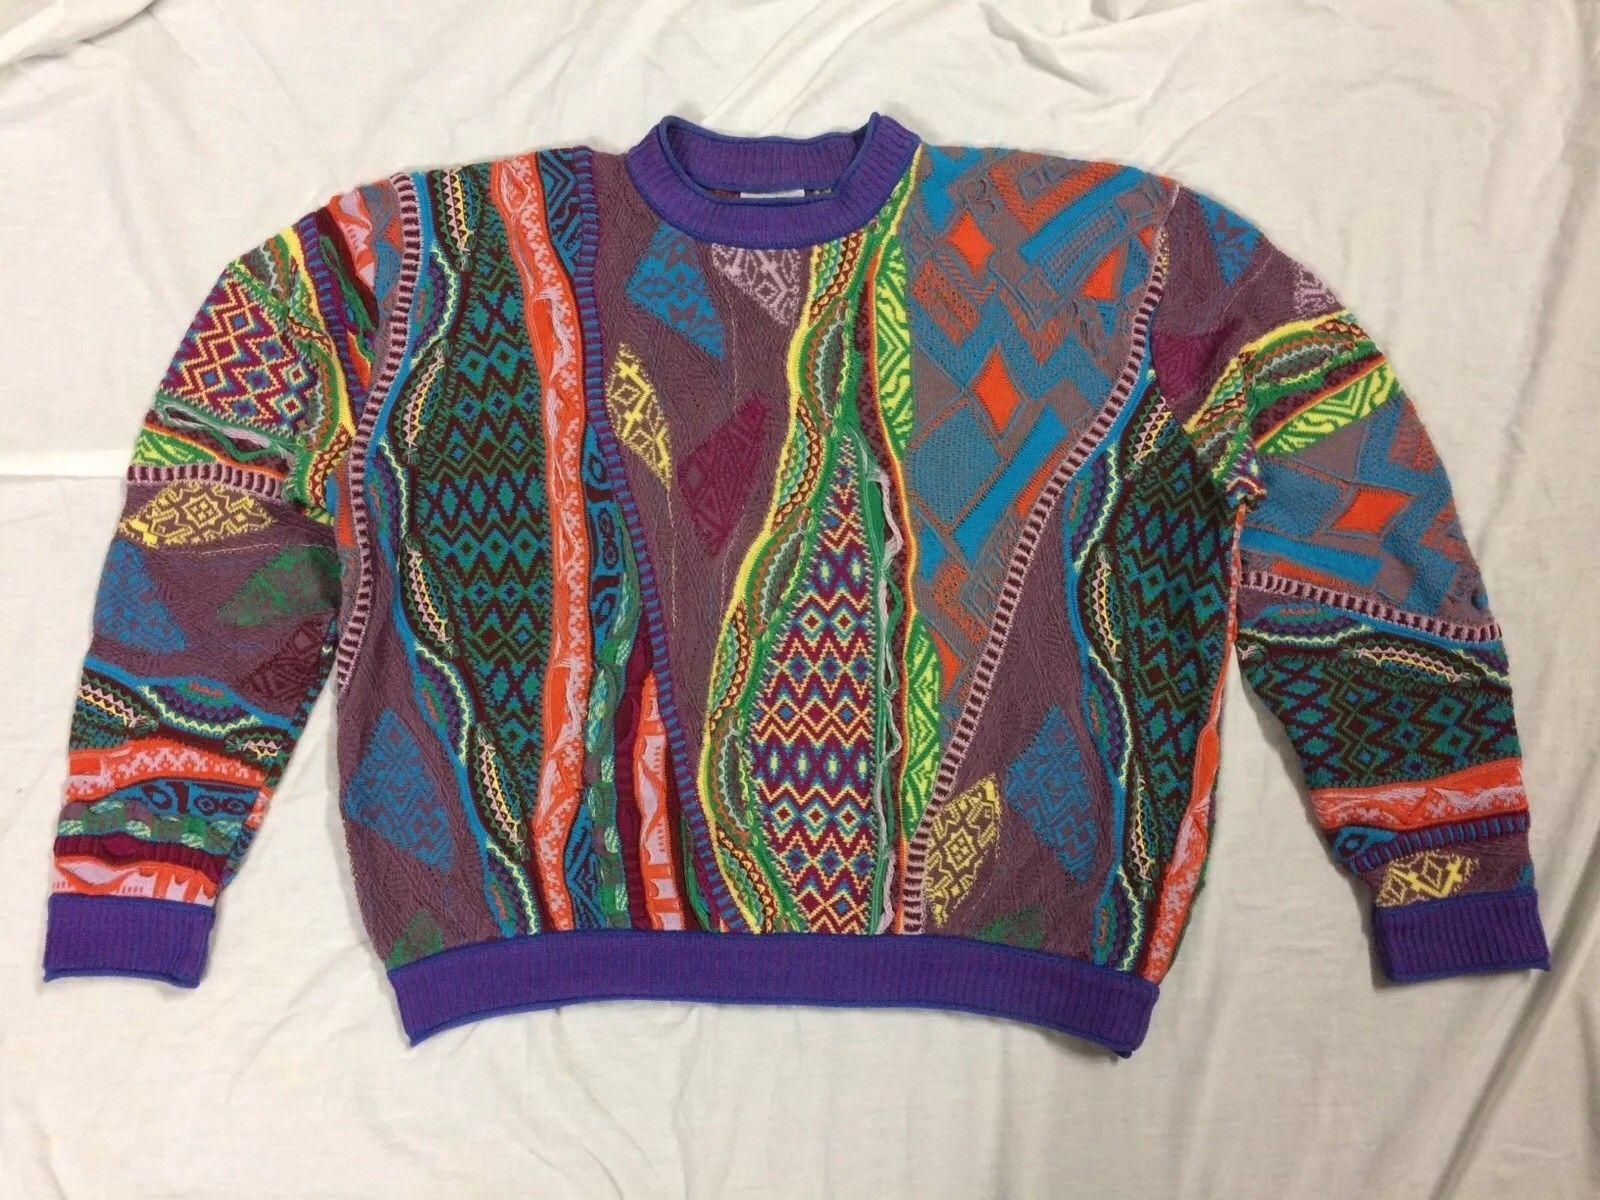 bcb25ef57f7 RARE 90s Vtg COOGI Australia NEON BIGGIE MCGREGOR Sweater L VAPORWAVE